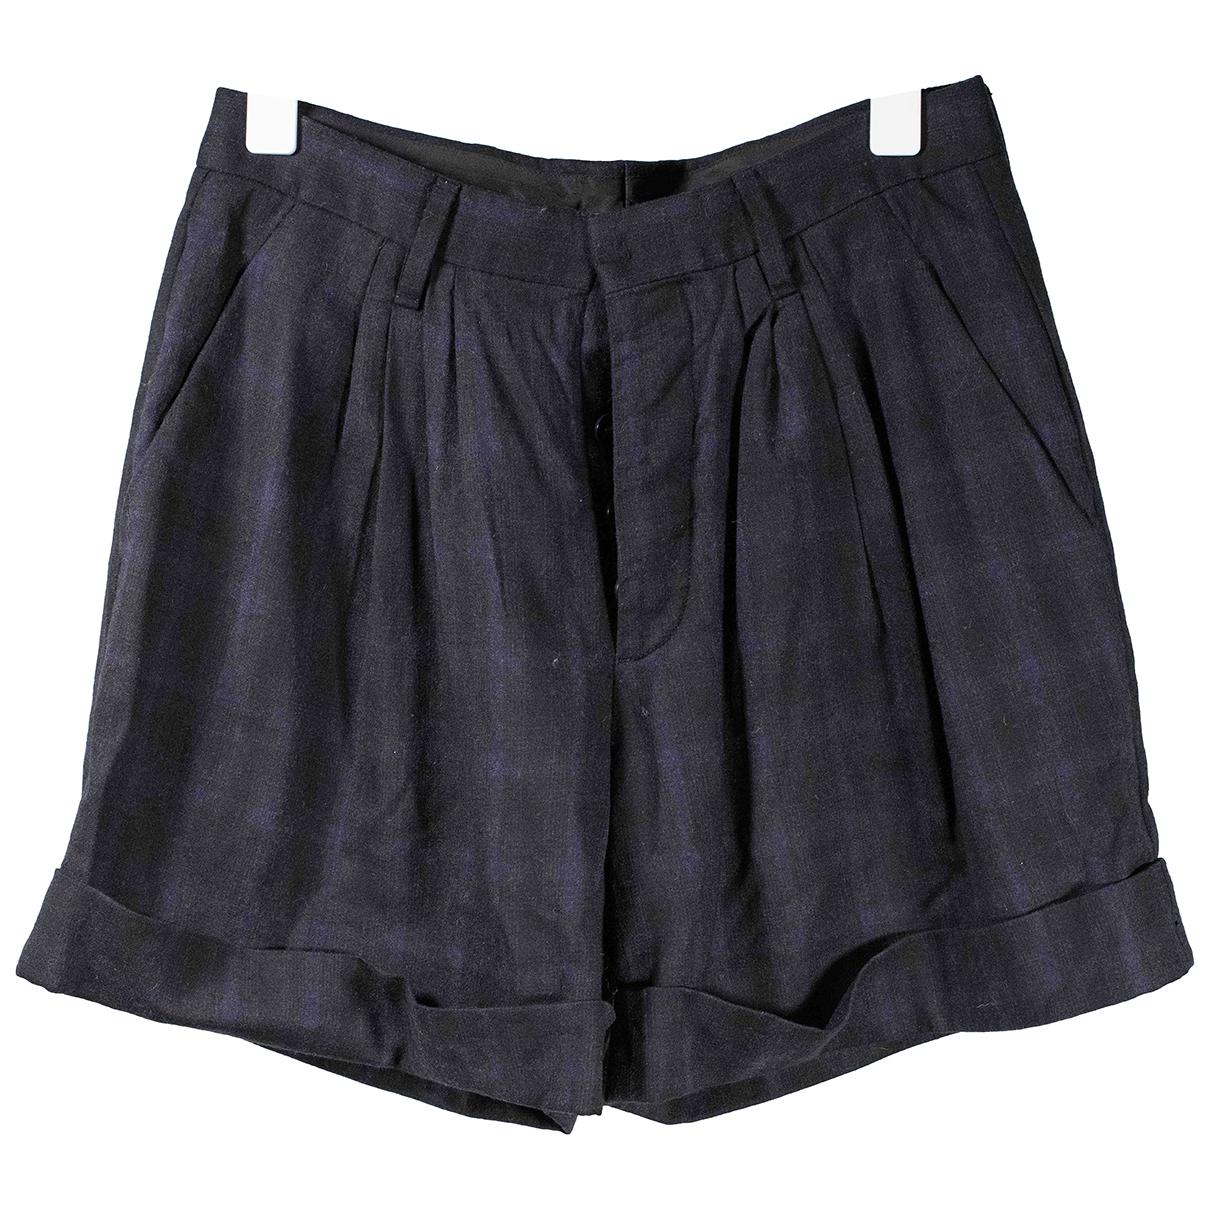 Miu Miu \N Shorts in  Schwarz Wolle